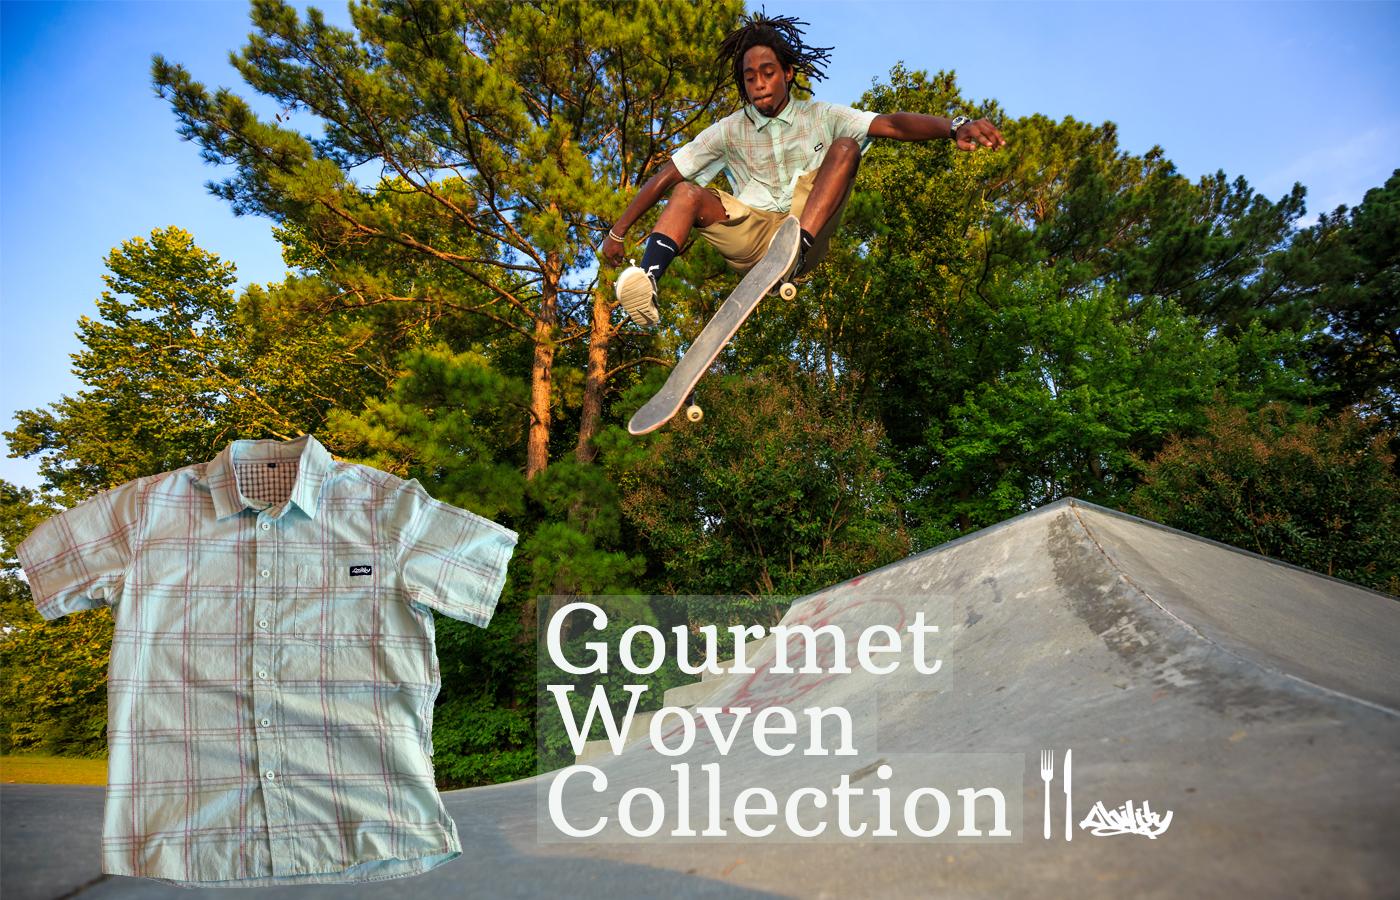 GourmetWovenSlider1400